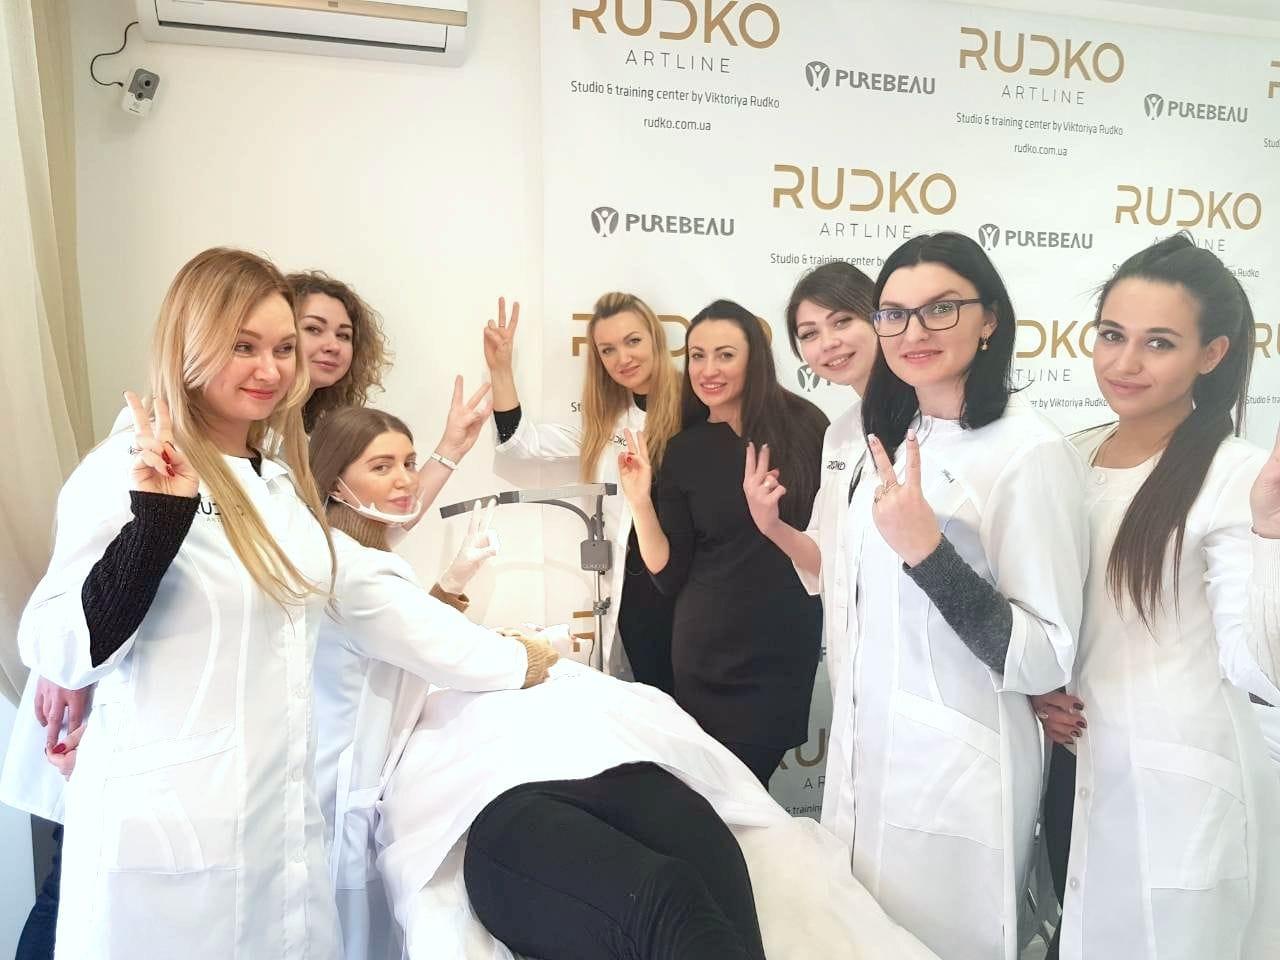 школа татуажа рудько артлайн выпускники март 2018